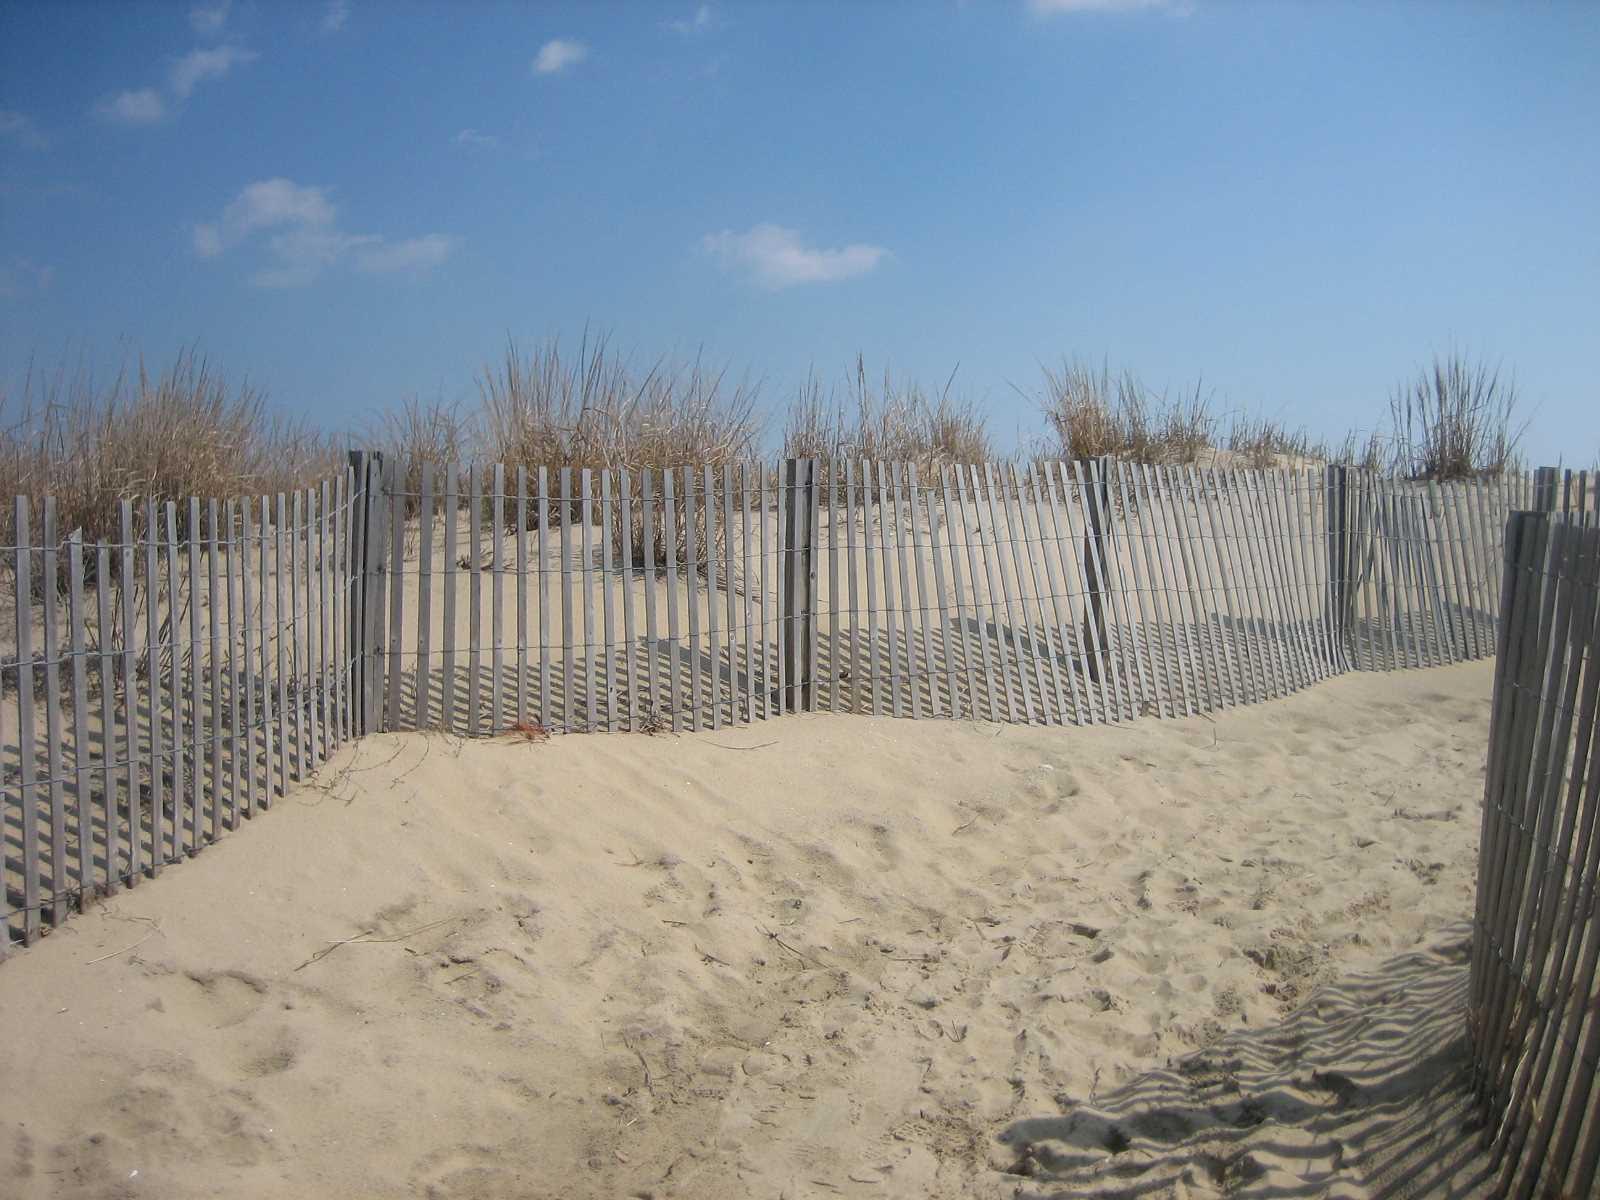 Dune crossng